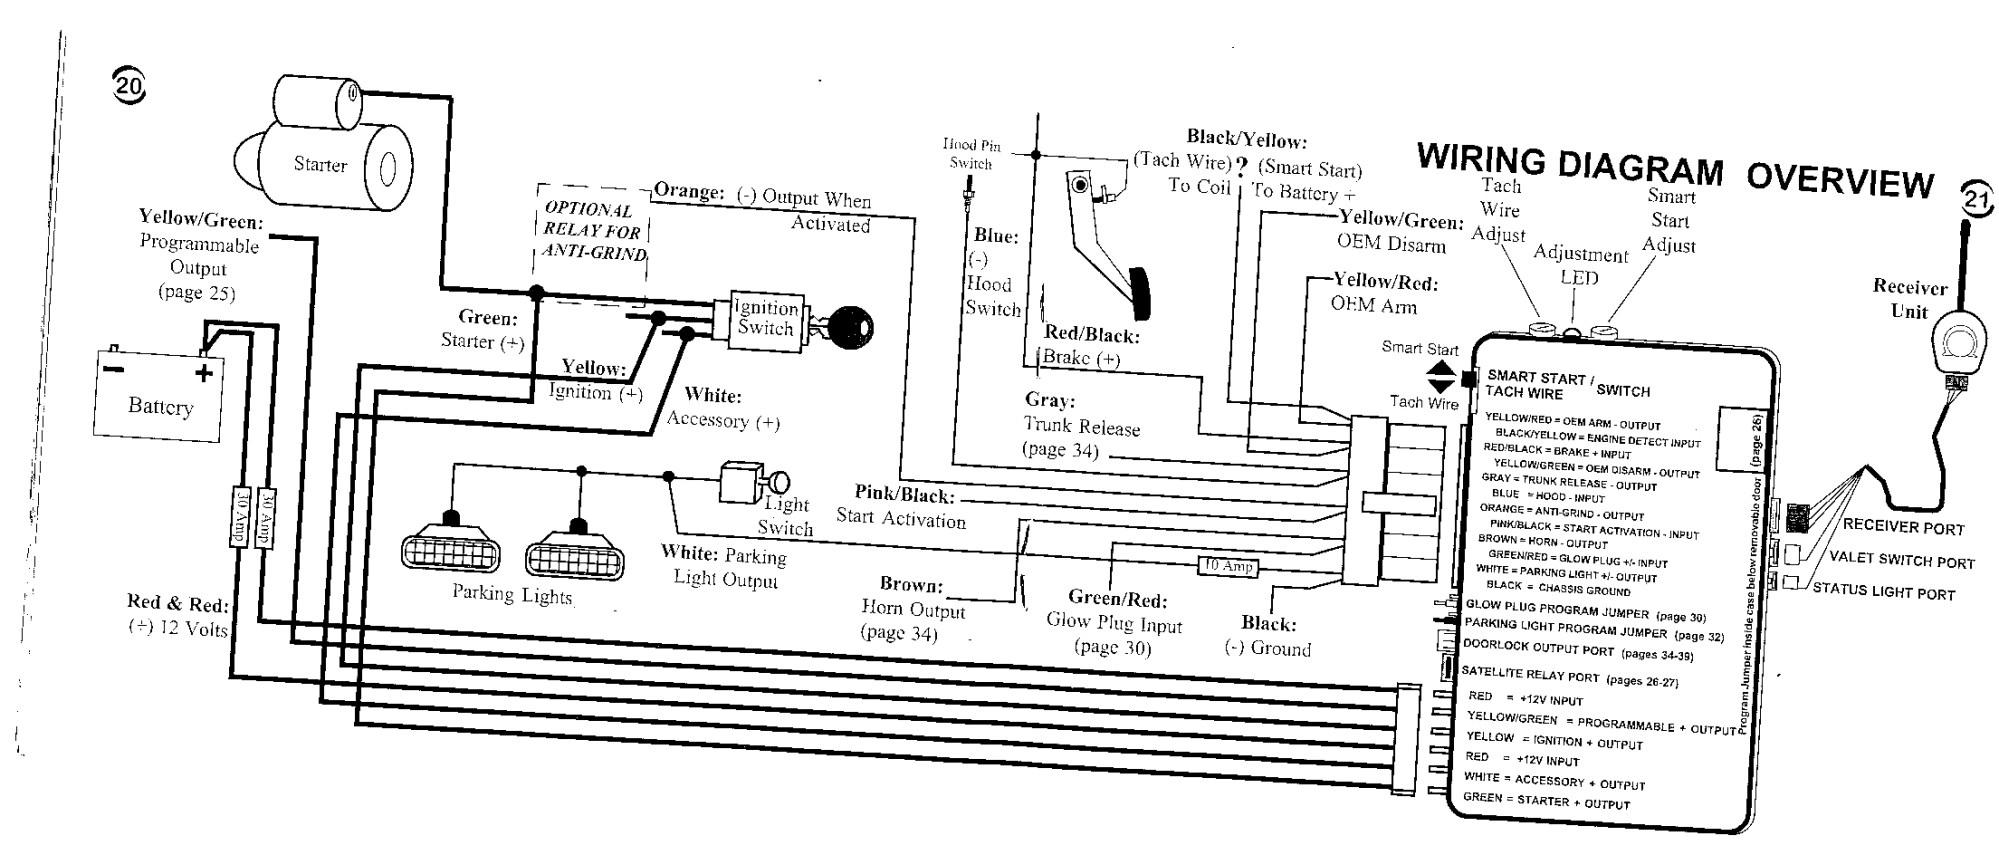 hight resolution of car alarm installation wiring diagram collection bulldog car wiring diagrams in club diagram 36 volt